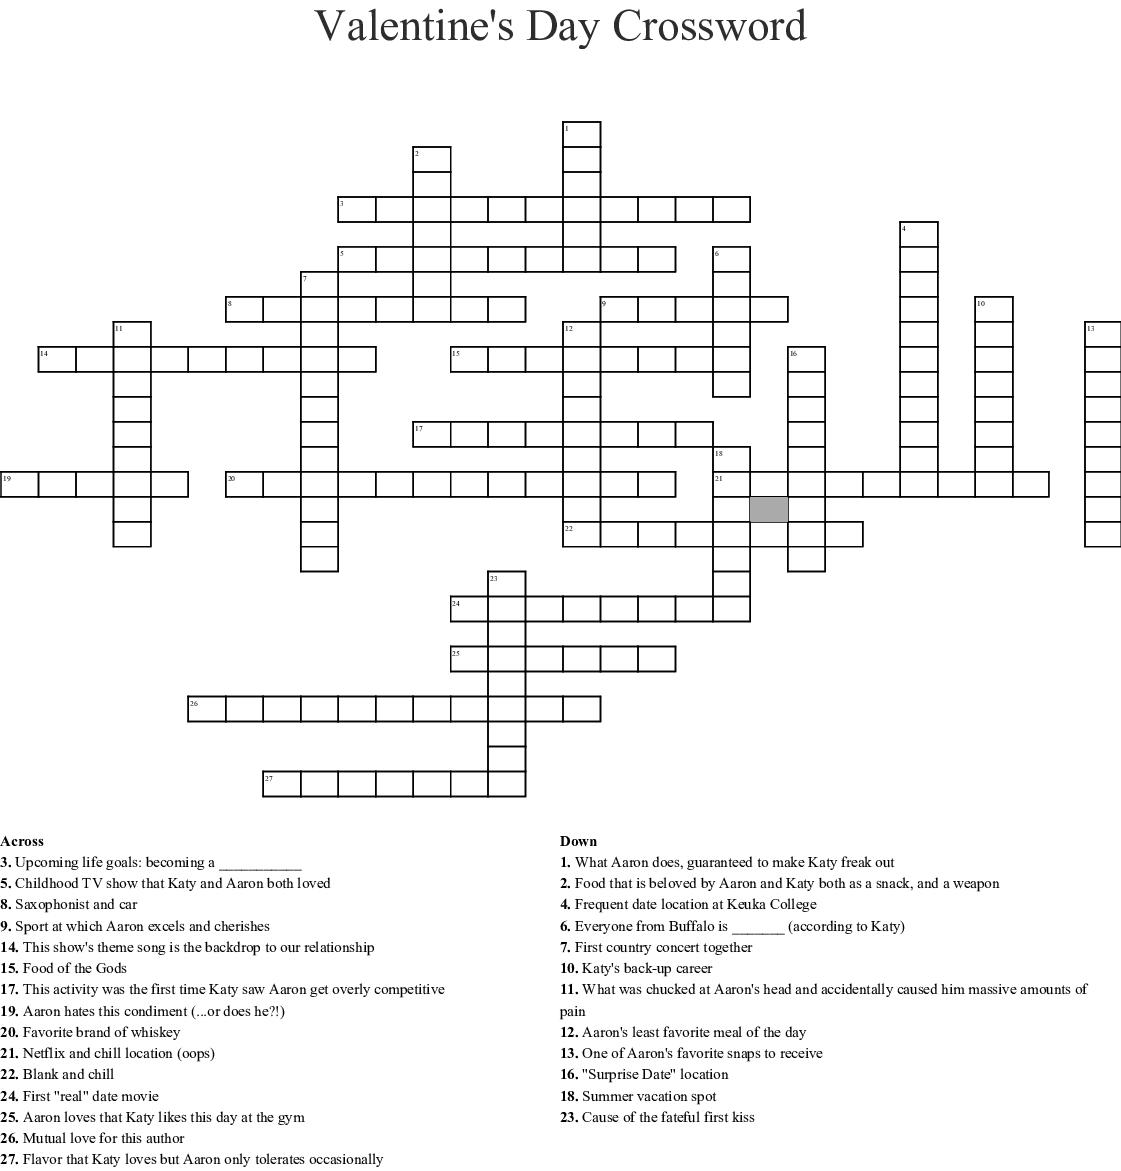 Constitution Day Crossword